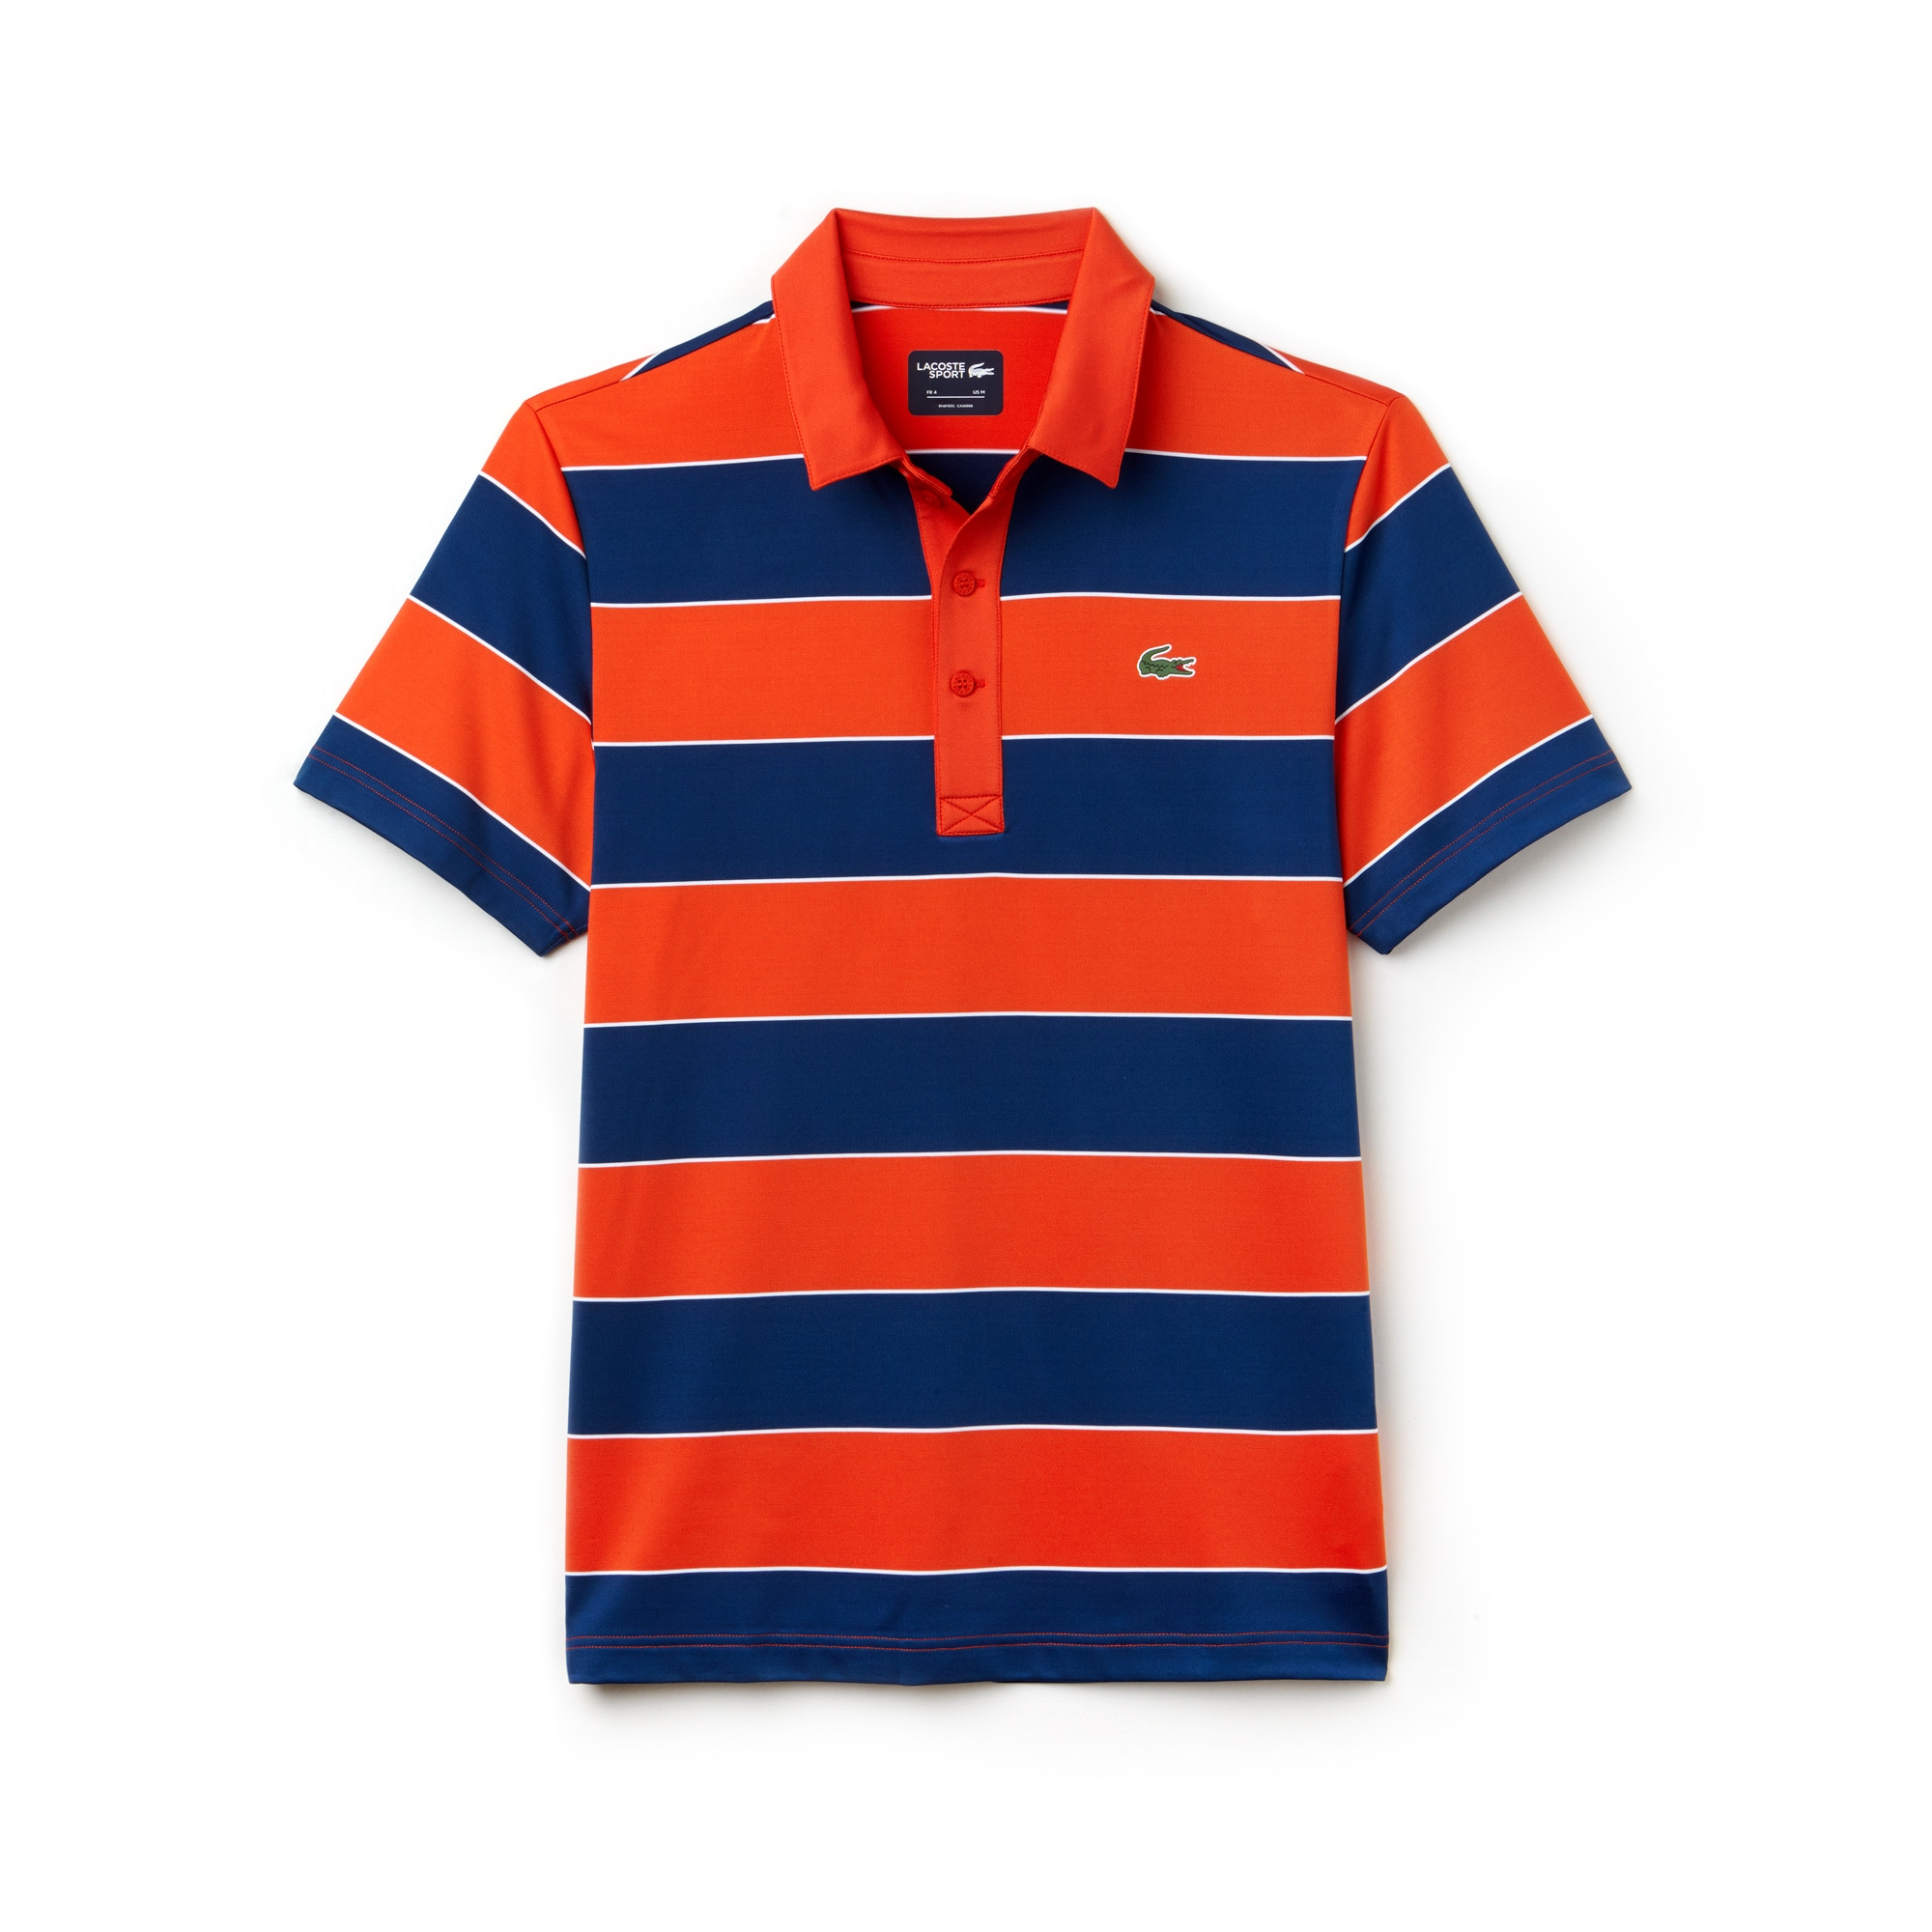 Lacoste SPORT Golf-polo heren gestreept jersey met stretch